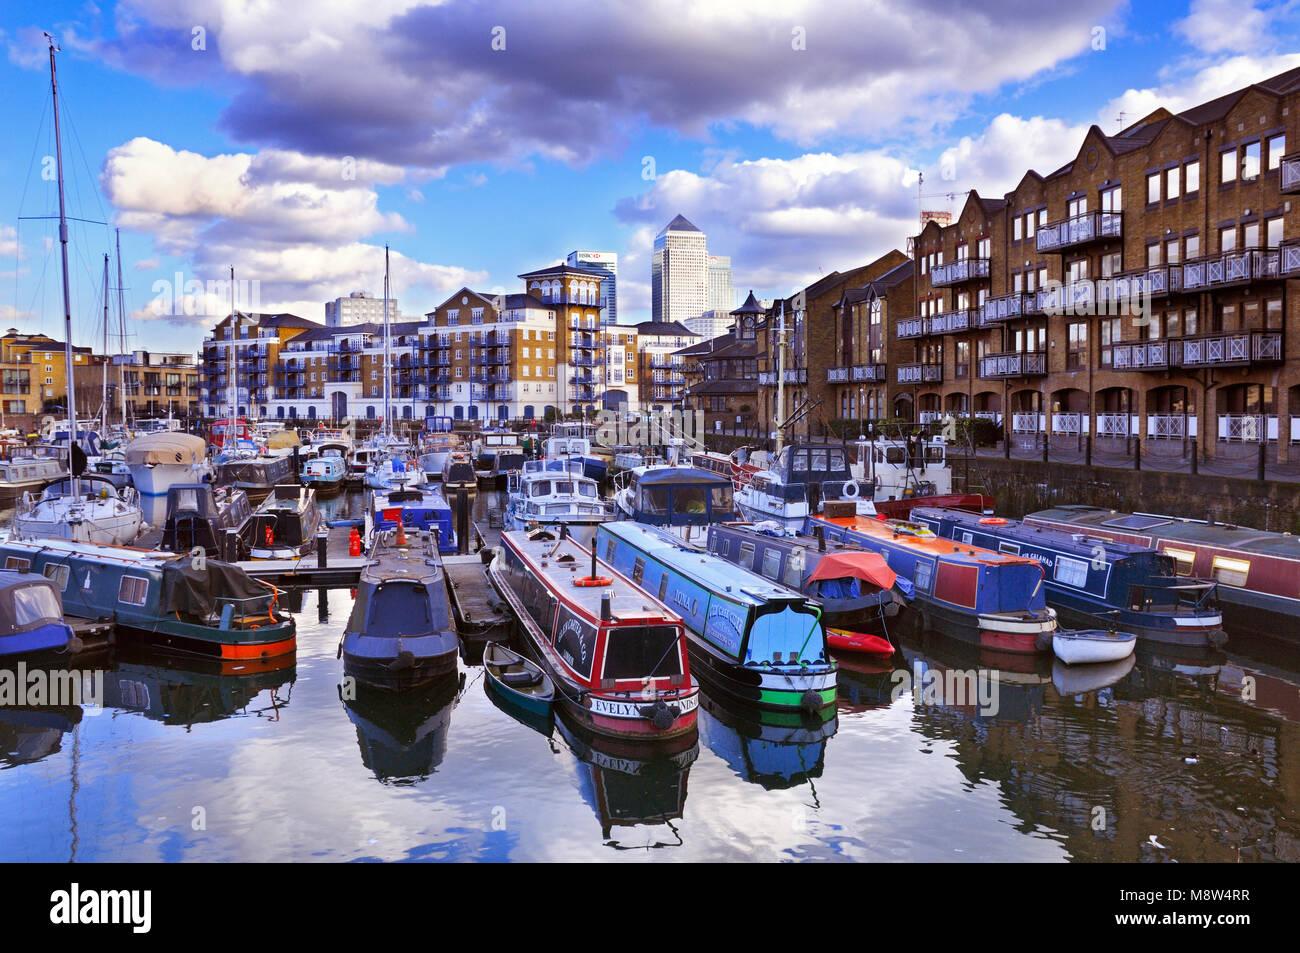 Limehouse Basin, Tower Hamlets, East London, UK - Stock Image